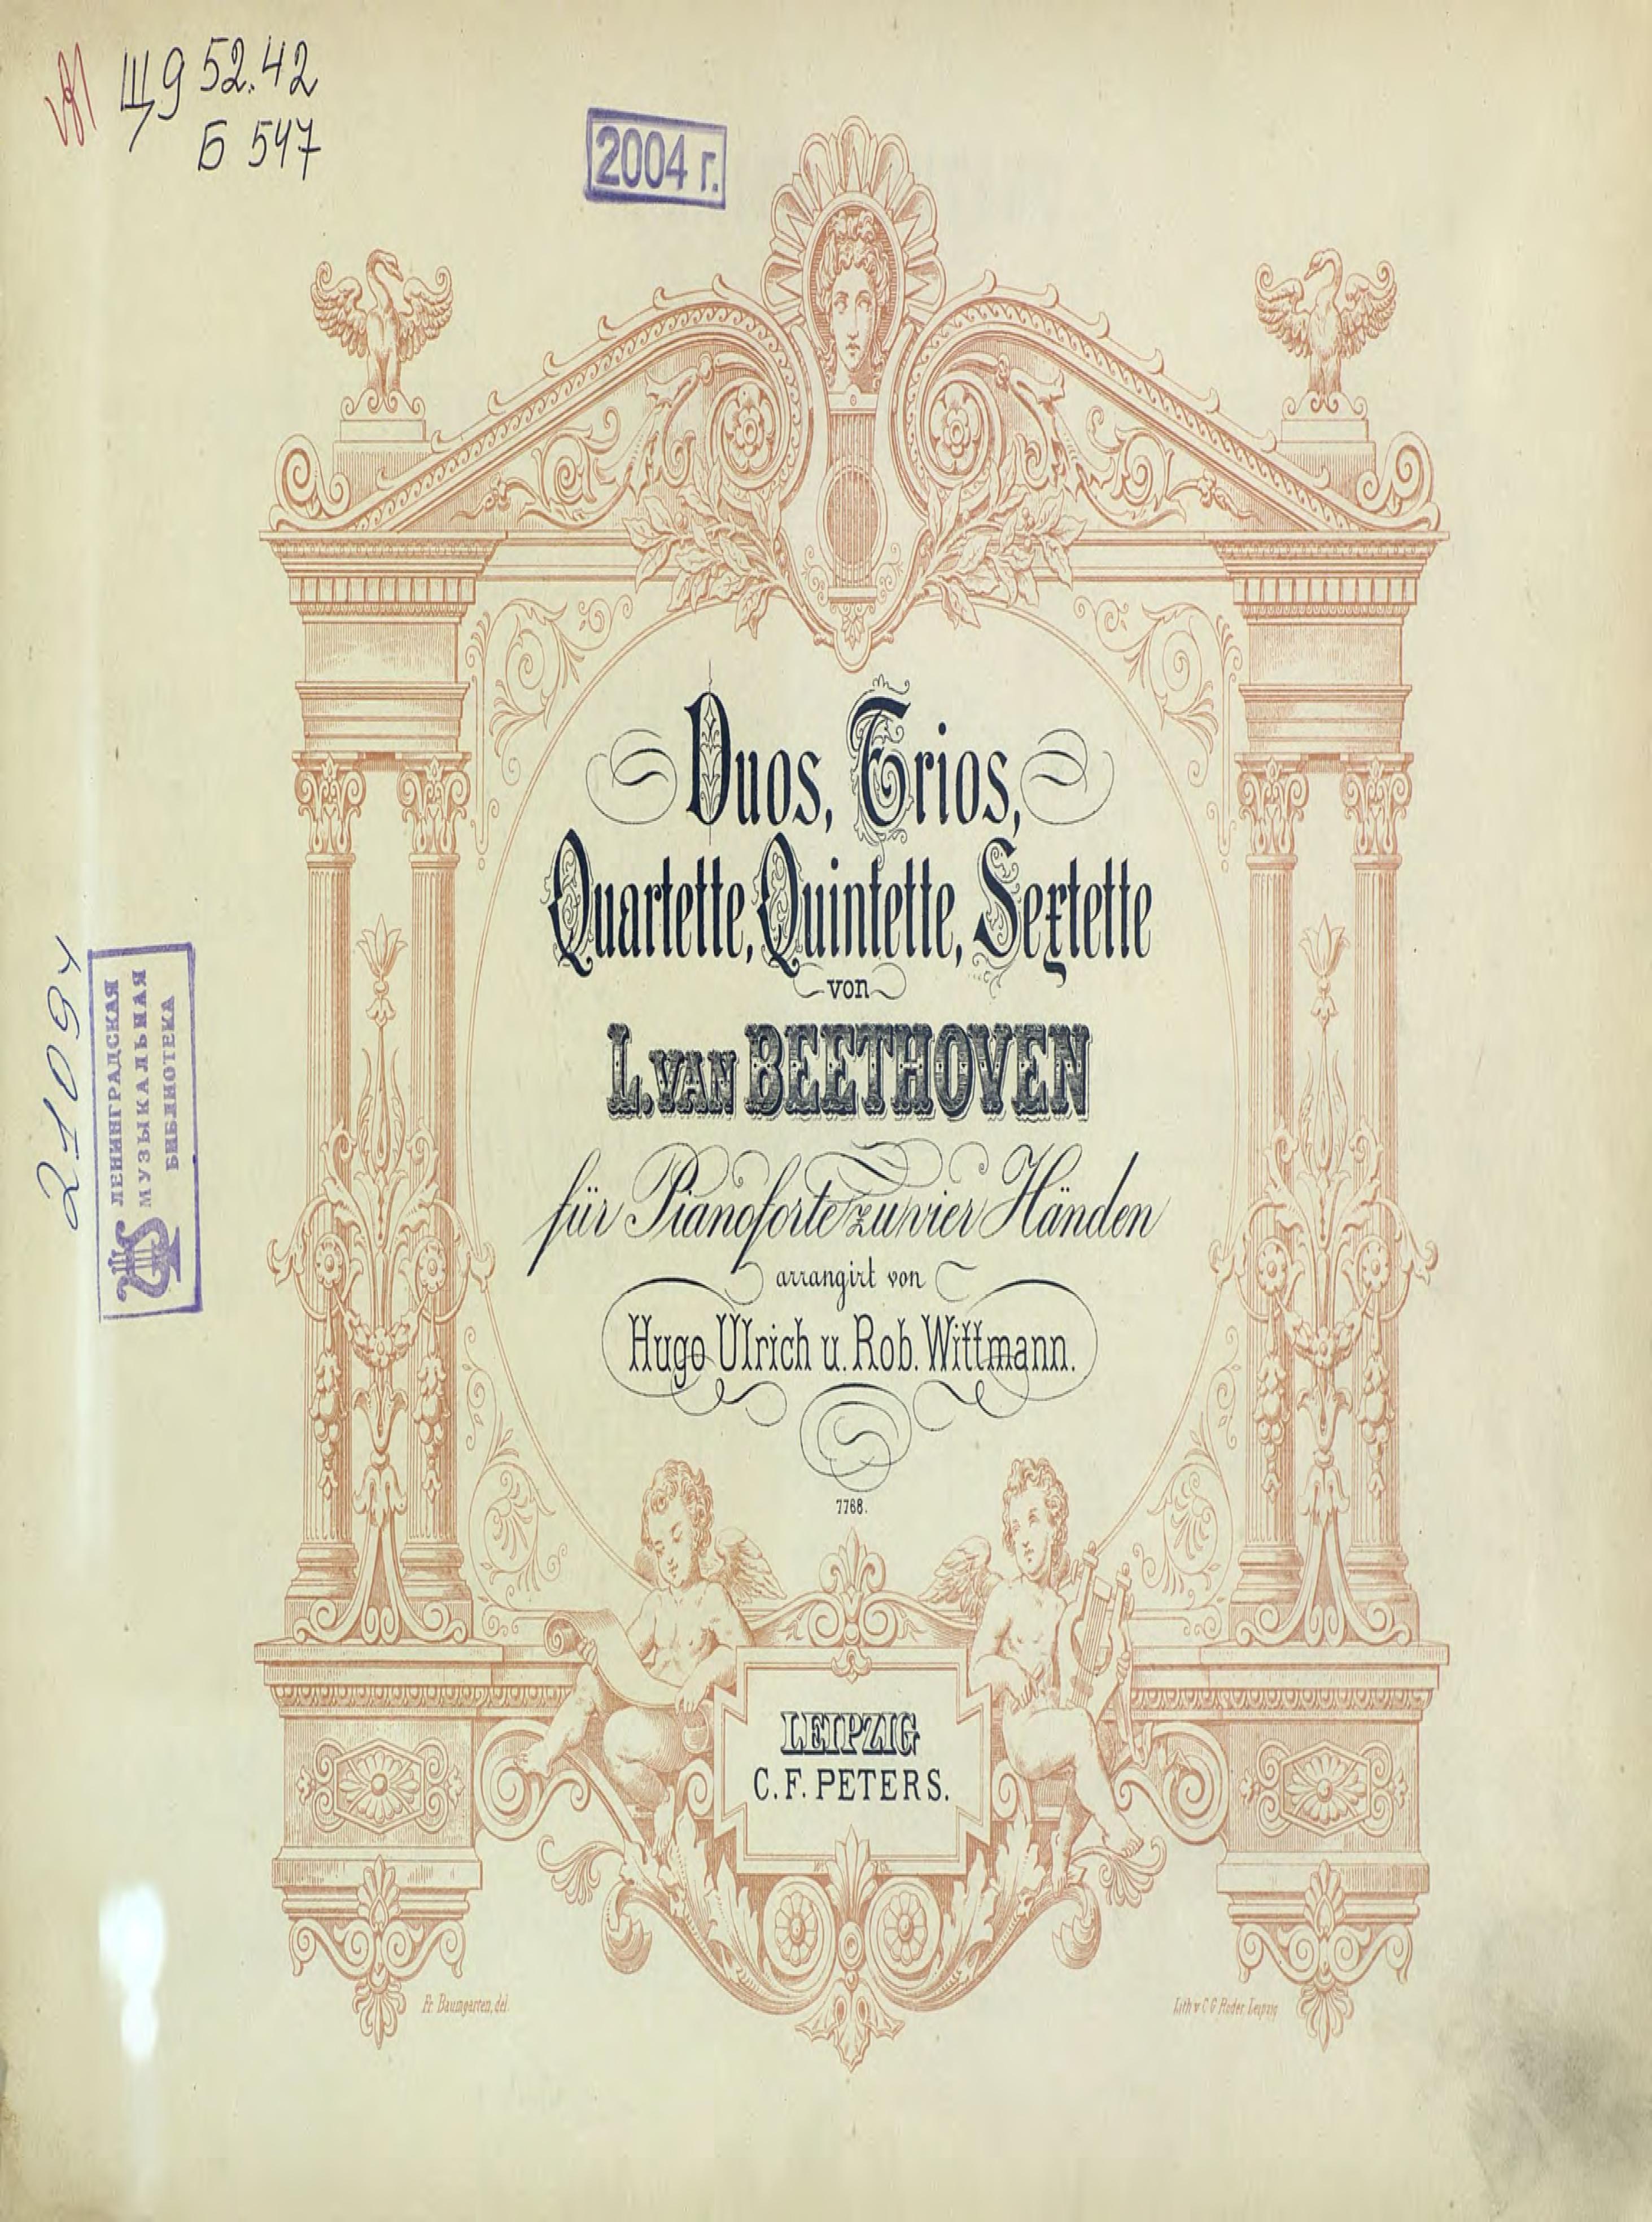 Людвиг ван Бетховен Quartette v. L. van Beethoven fur Pianoforte zu 4 Hd. людвиг ван бетховен promethee die geschopfe des prometheus de beethoven